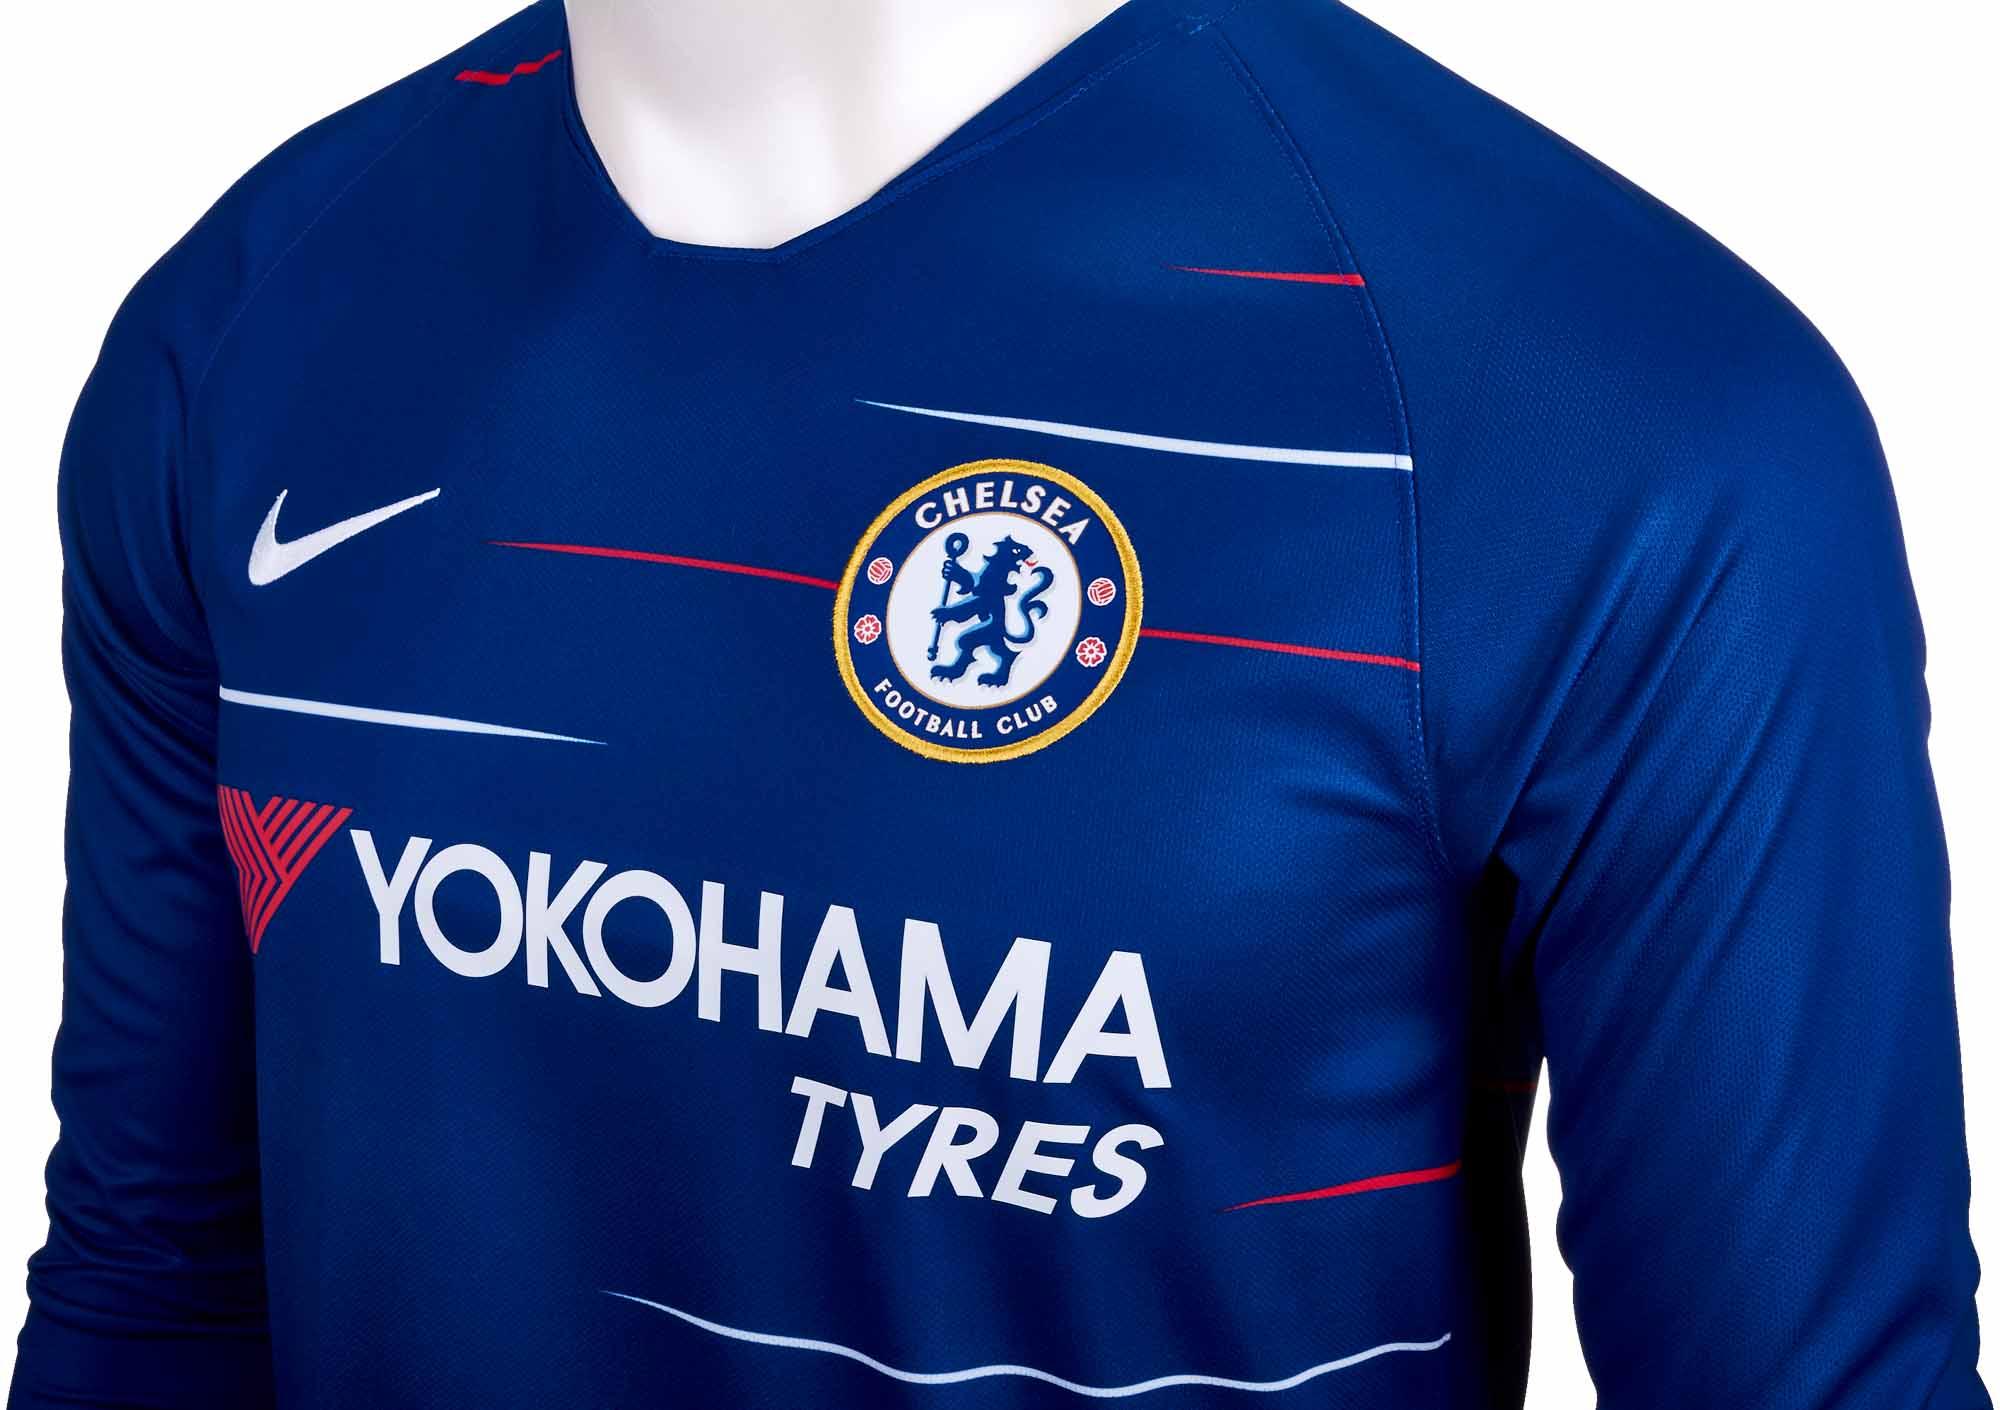 outlet store 4600e 8c5af 2018/19 Nike Chelsea Home L/S Jersey - Soccer Master